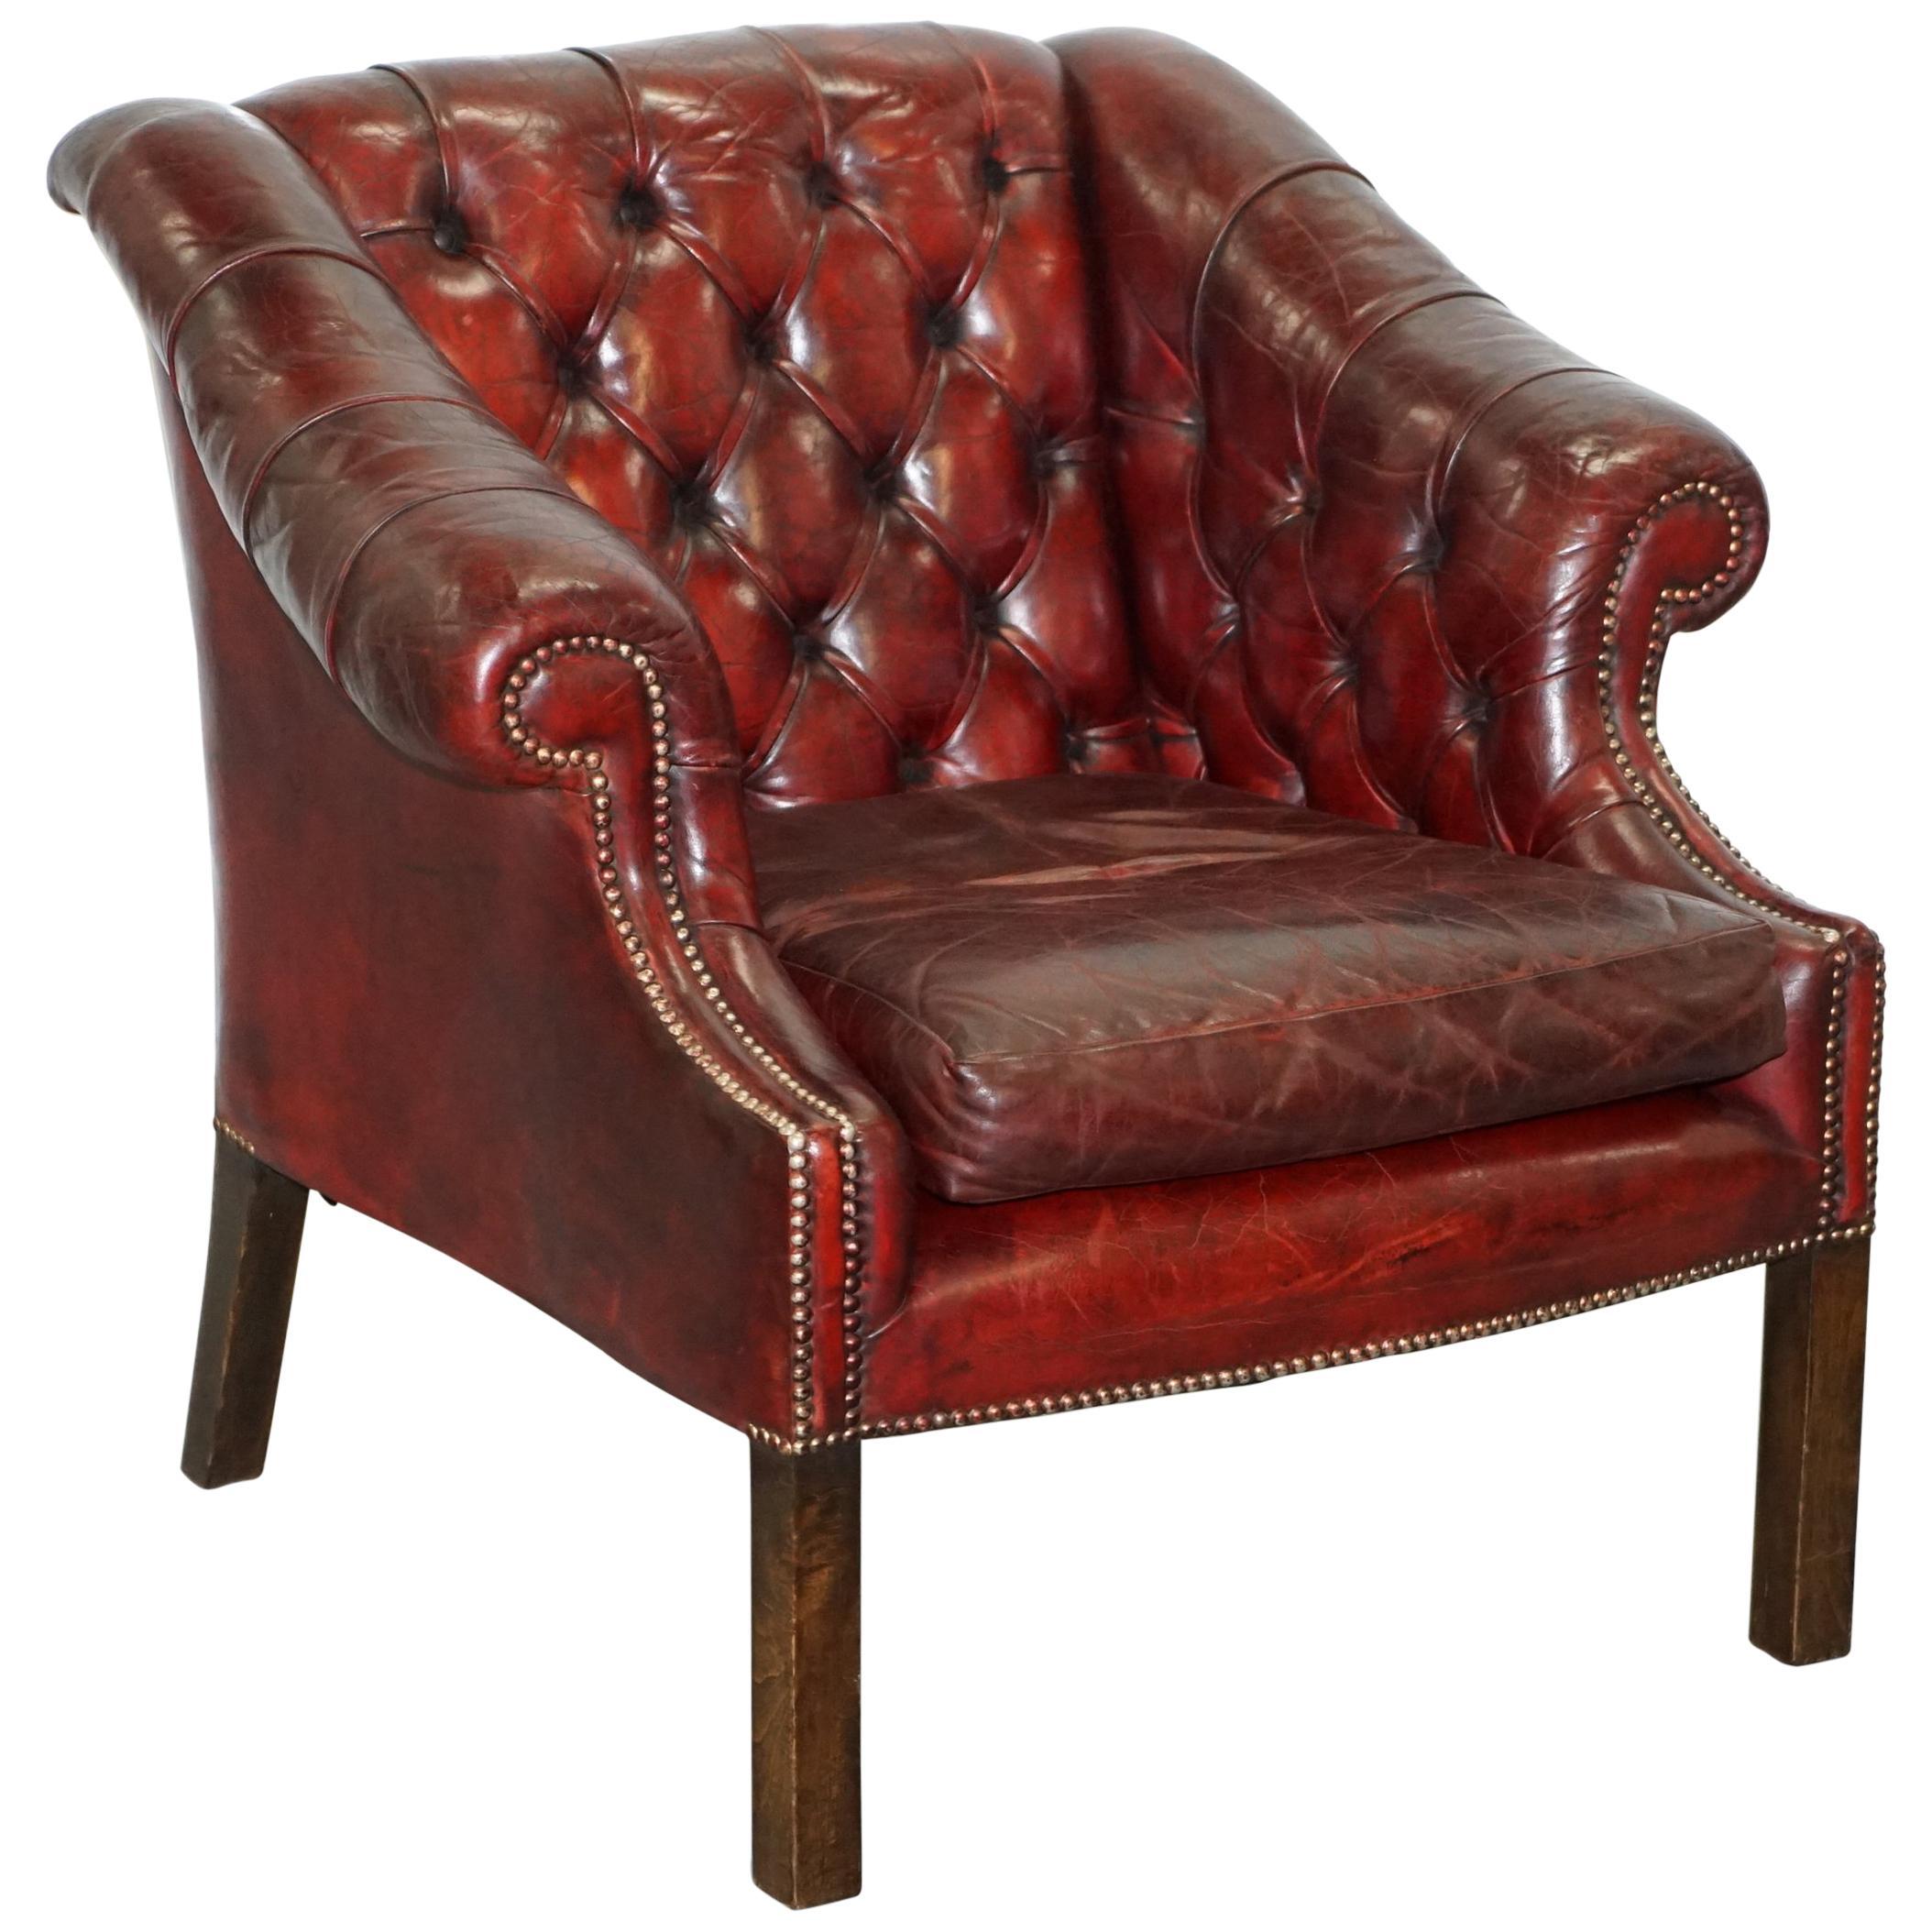 Charmant Rare Midcentury Chesterfield Lutyenu0027s Style Viceroyu0027s Oxblood Leather  Armchair